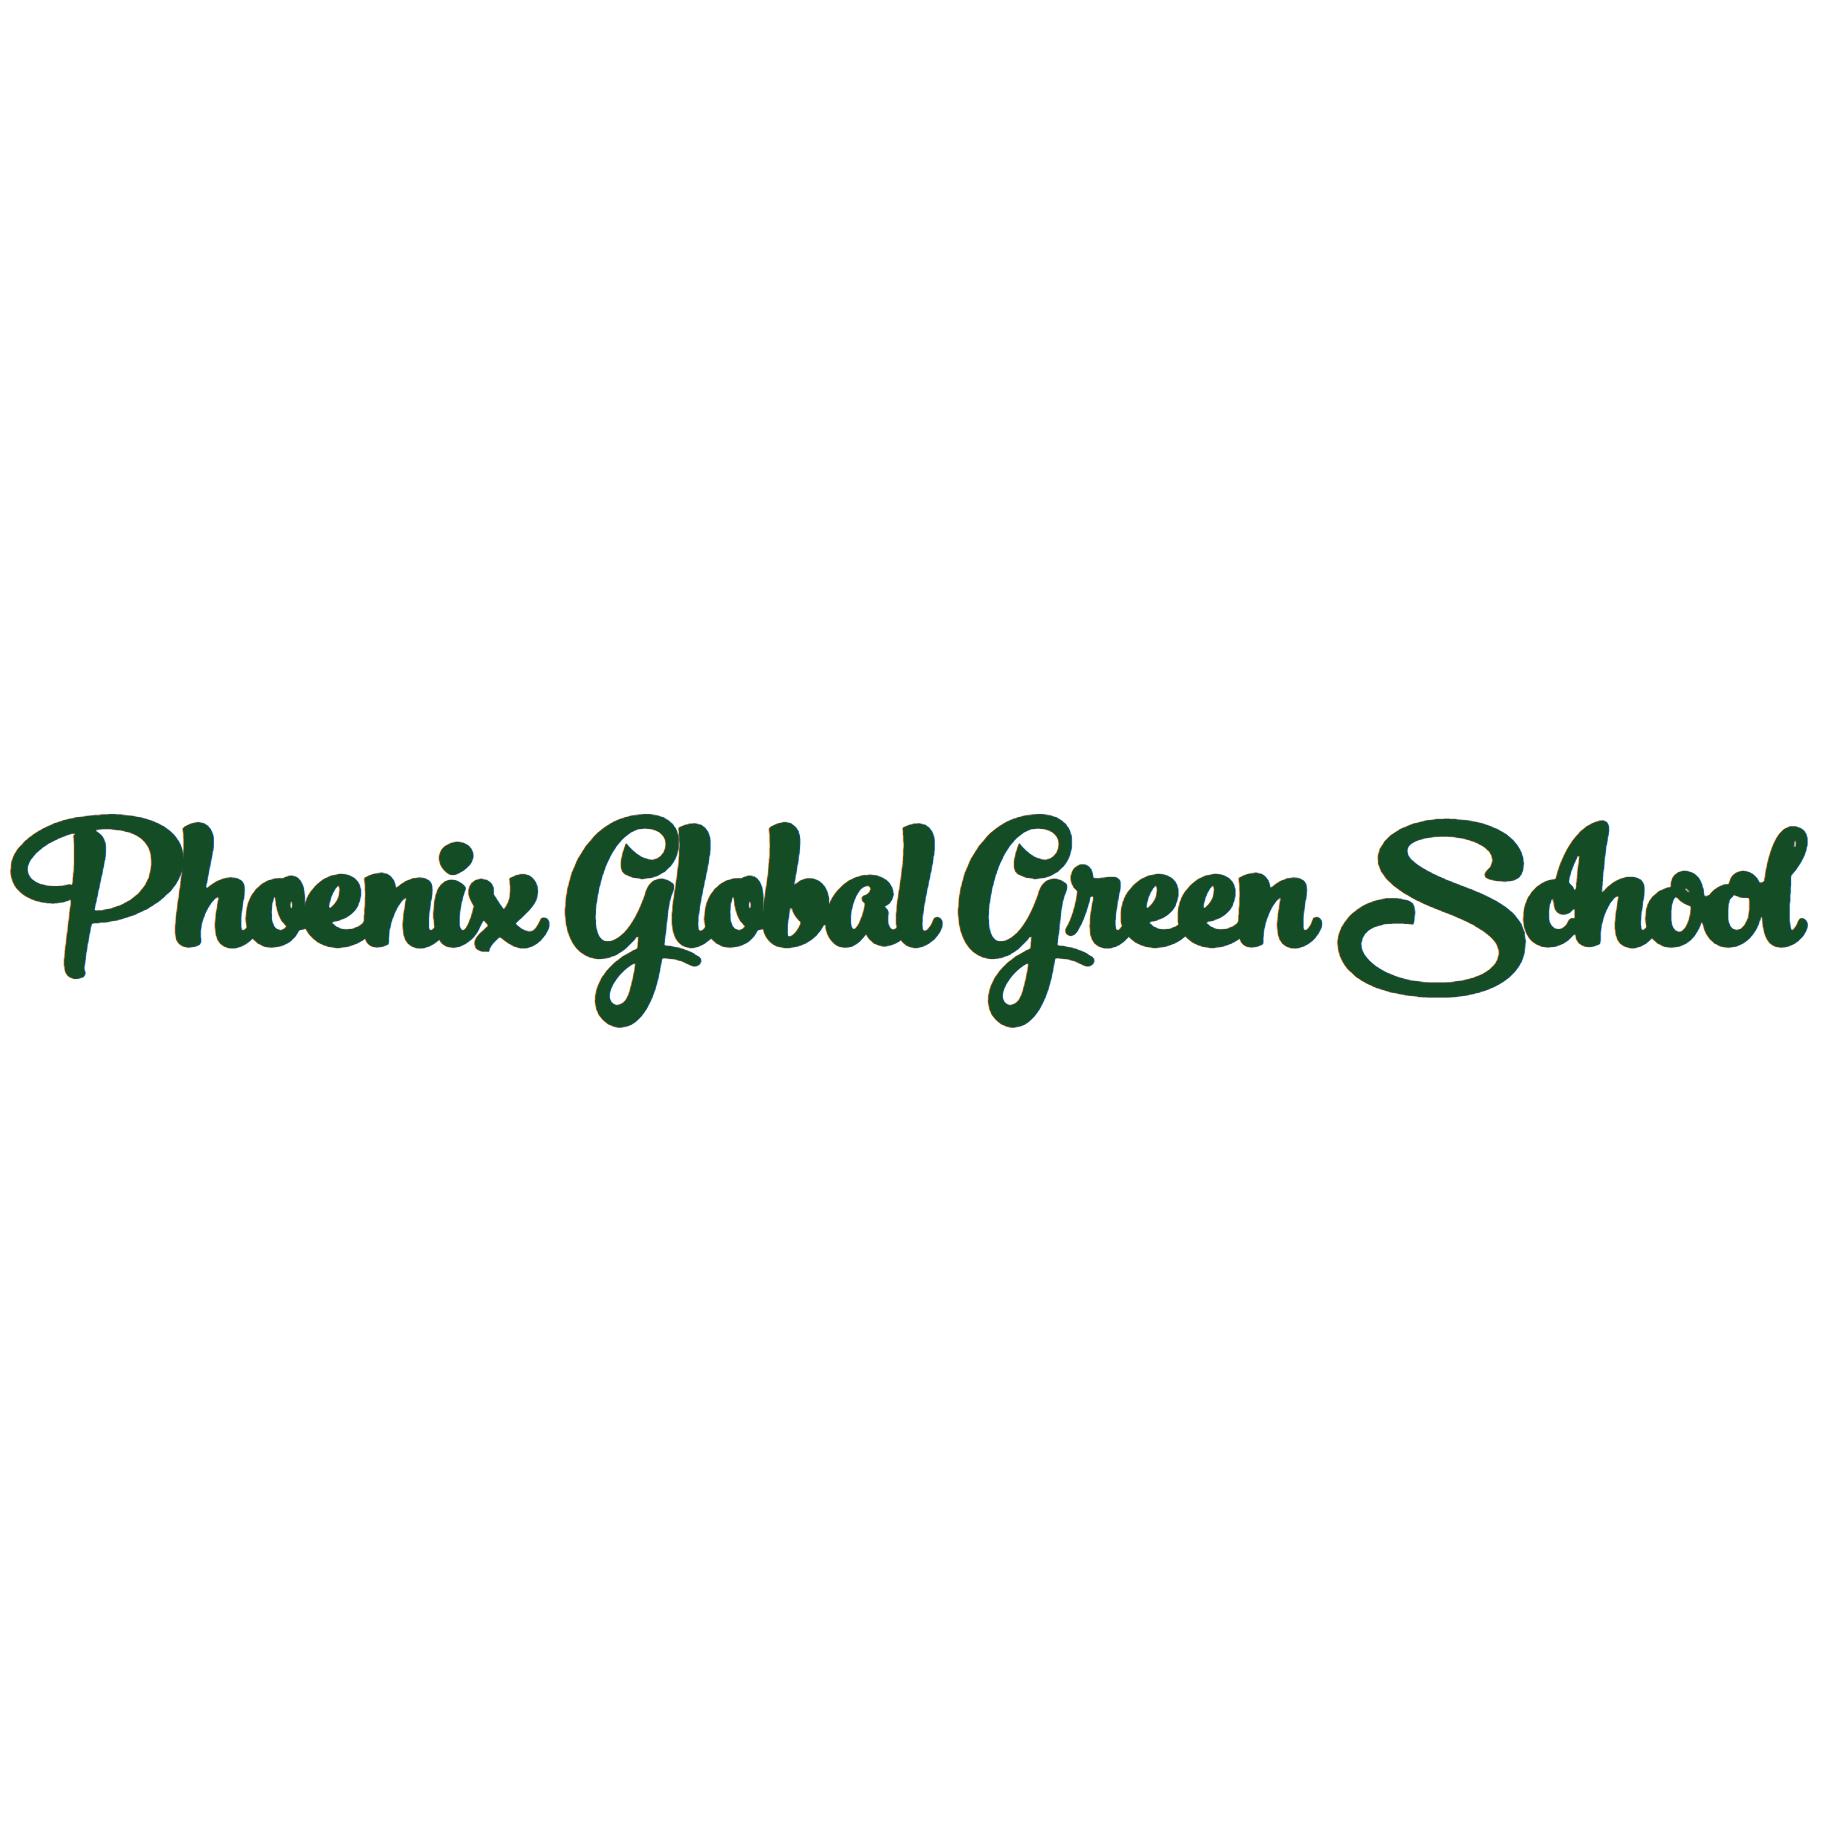 Phoenix Global Green School